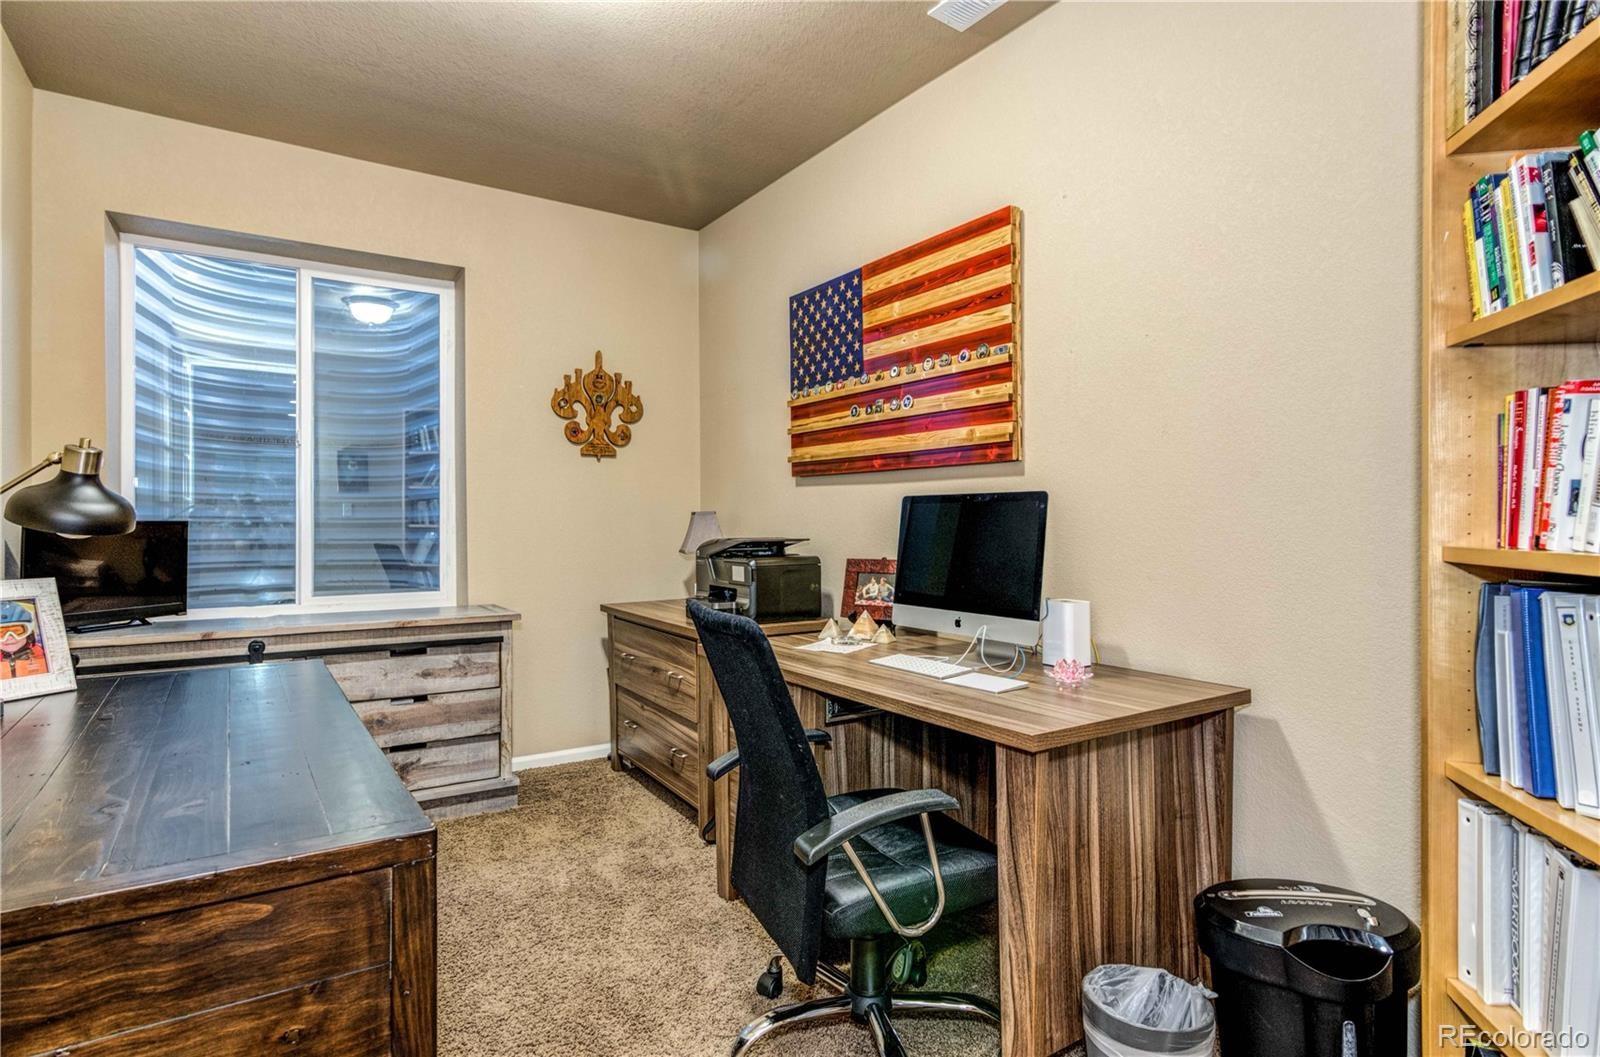 MLS# 4961371 - 29 - 7487 Mountain Spruce , Colorado Springs, CO 80927